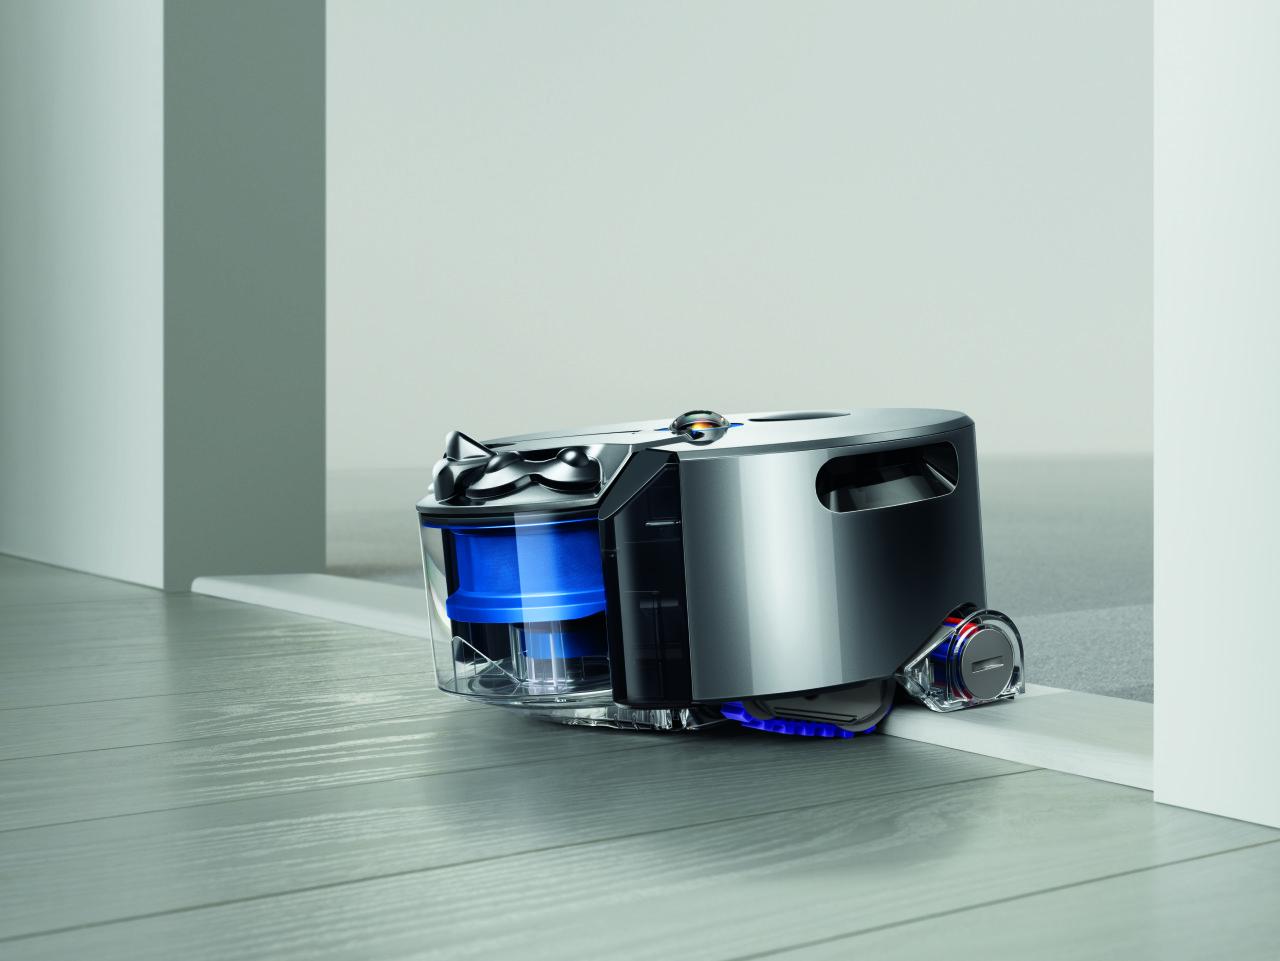 l 39 aspirateur robot dyson 360 eye se fait attendre. Black Bedroom Furniture Sets. Home Design Ideas